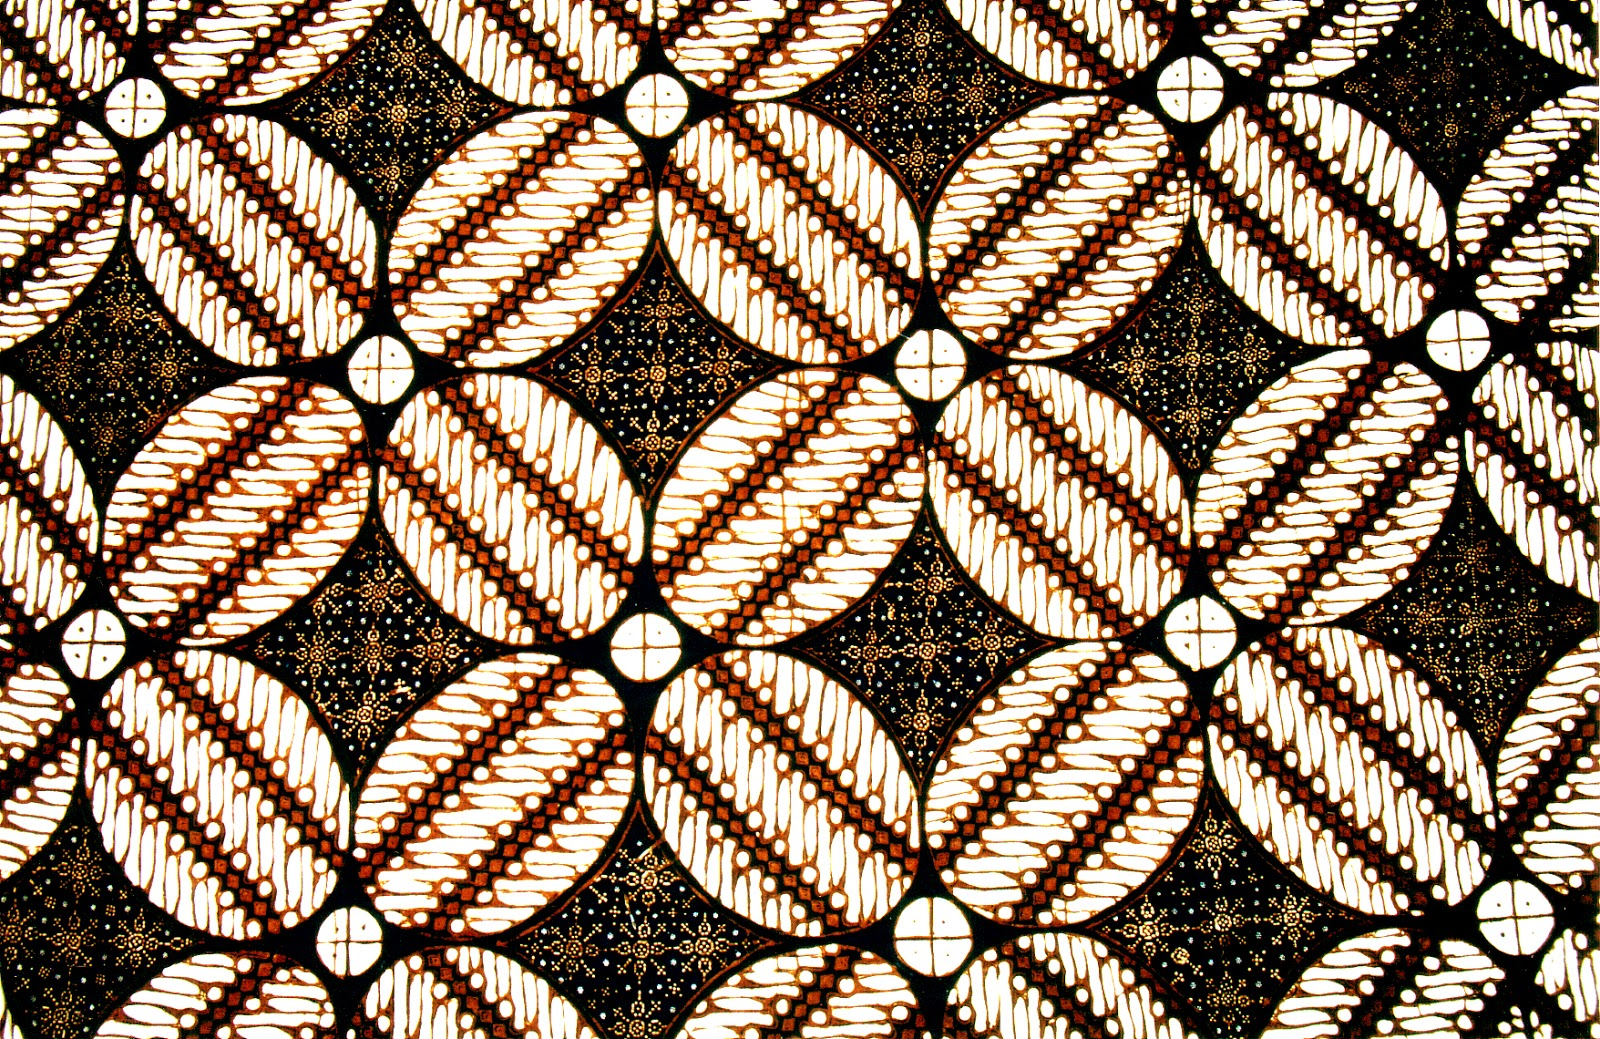 Memahami Filosofi Batik Nusantara Mizanstore Blog